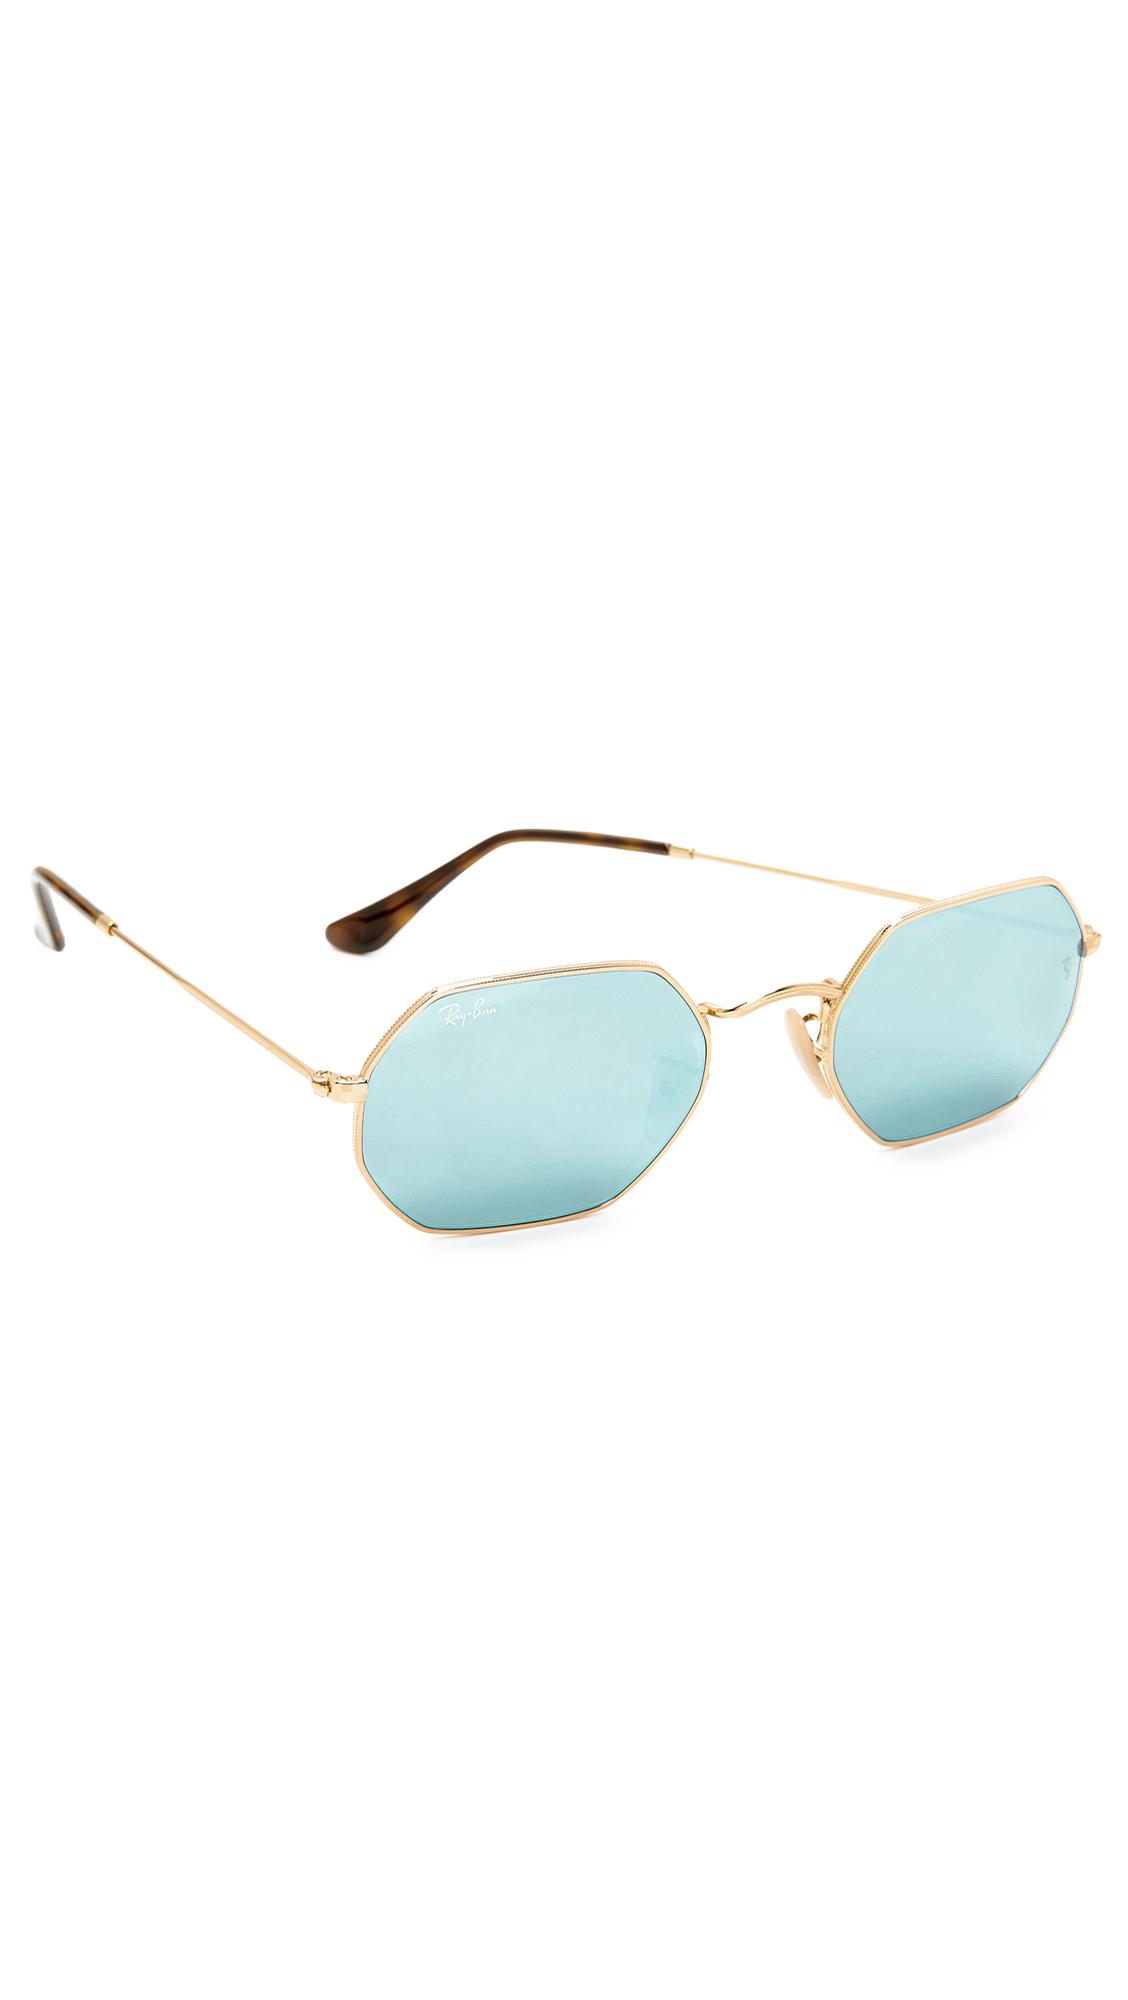 eba0b03ef3 Ray-Ban Octagon Flat Lens Sunglasses